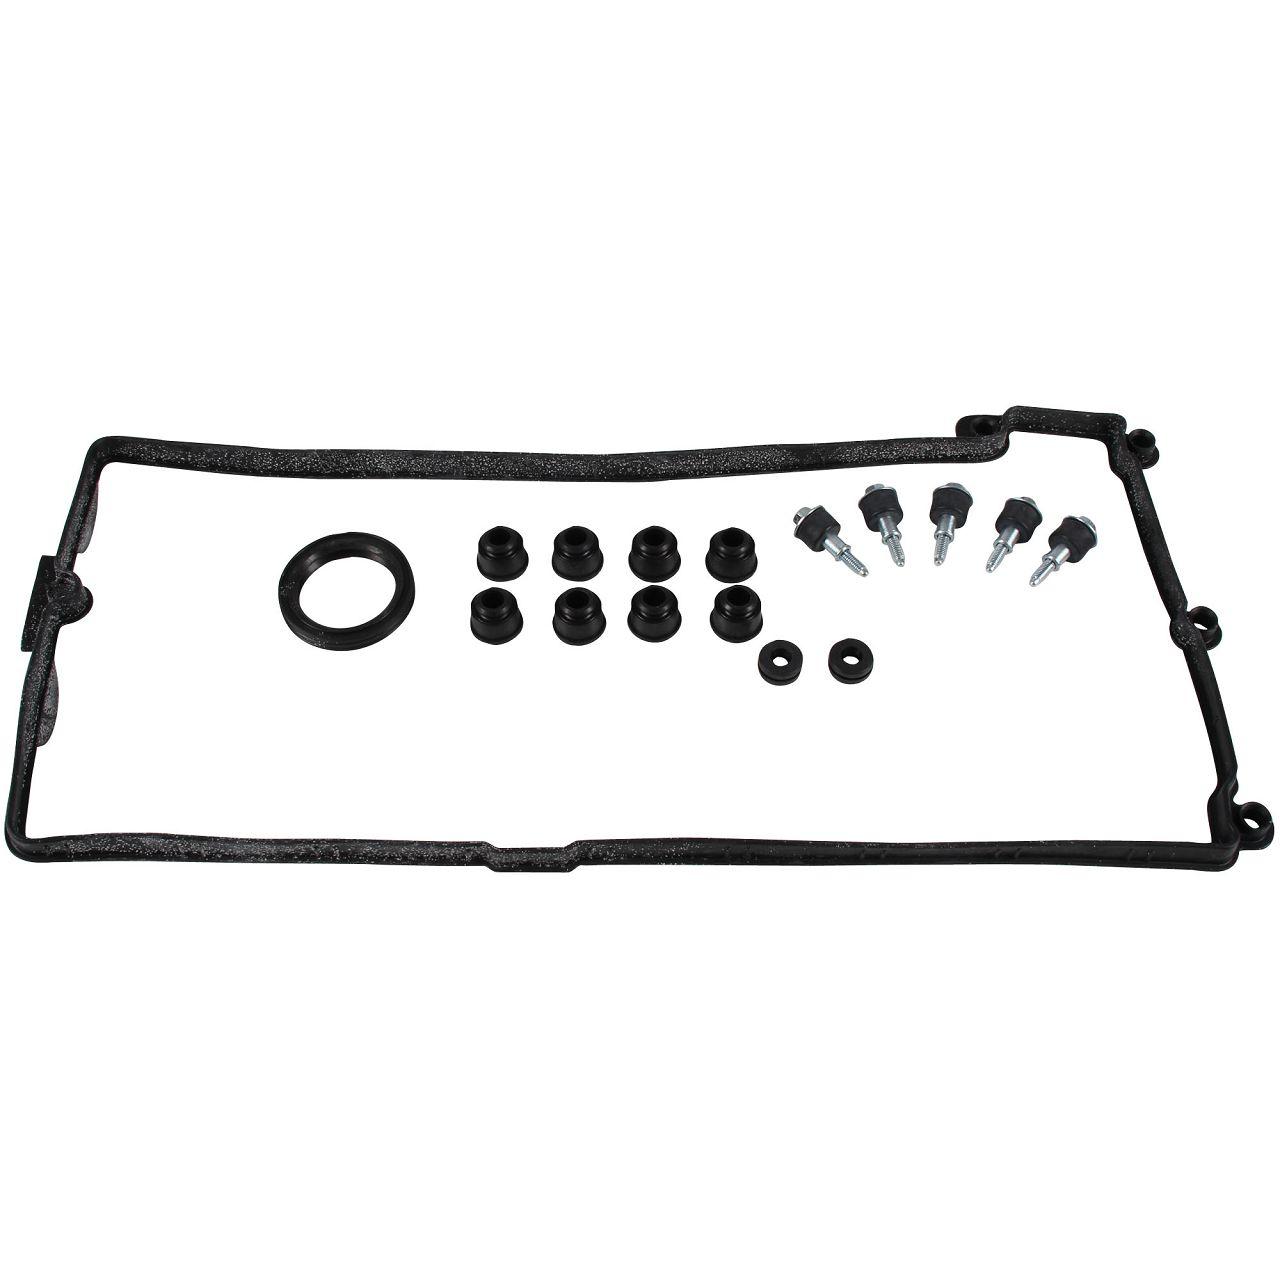 Ventildeckeldichtung Zylinder 5-8 für BMW E60 E61 E63 E64 E65 X5 N62 11127513195